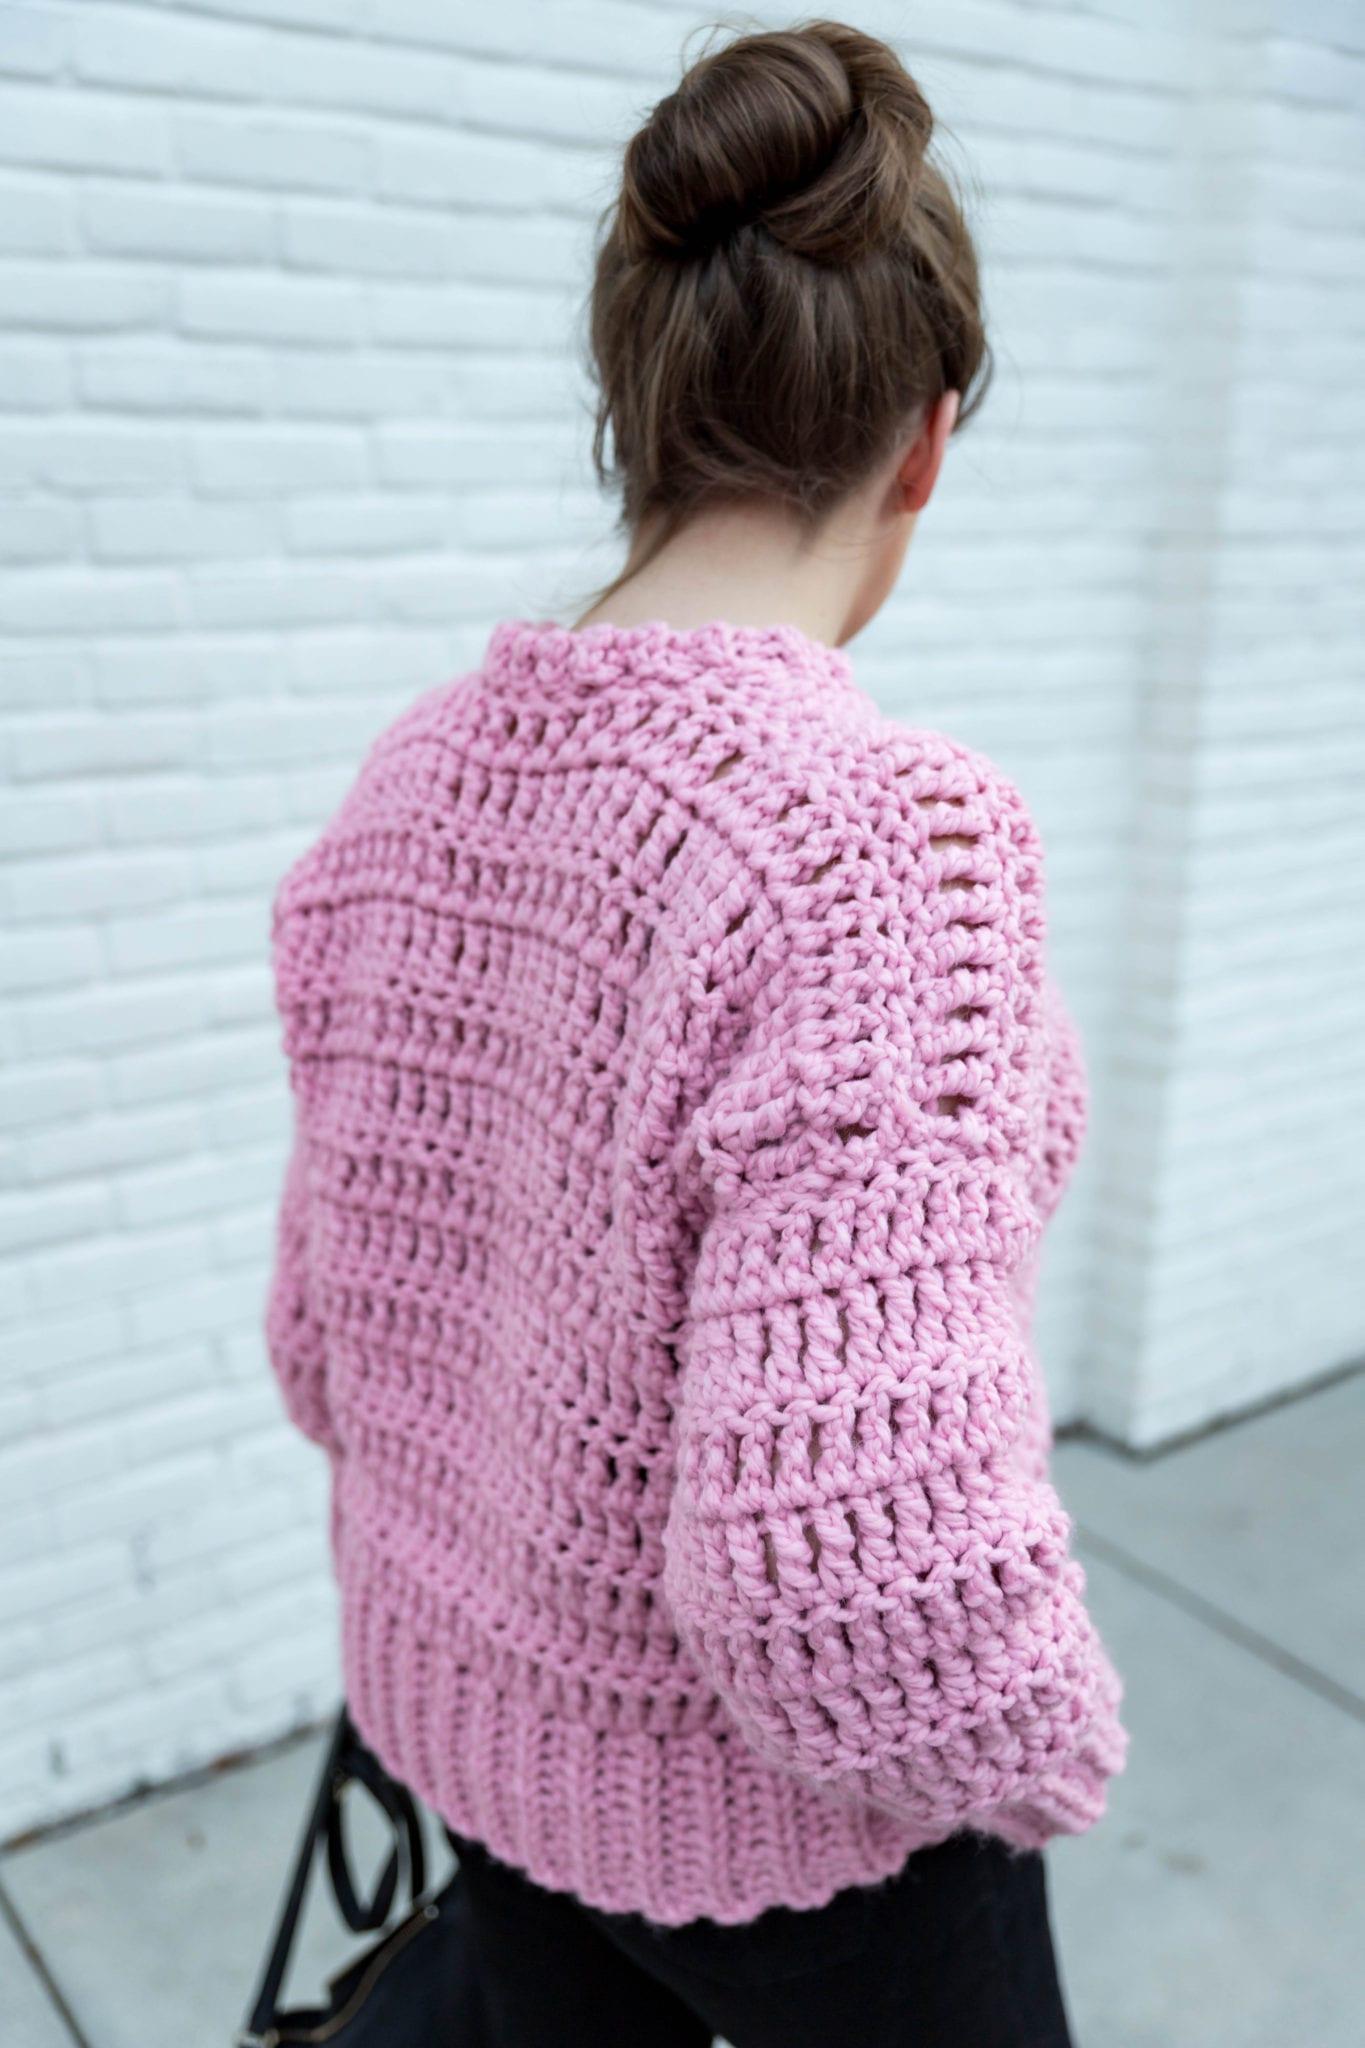 Crochet Bubblegum Pullover Sweater - Sewrella